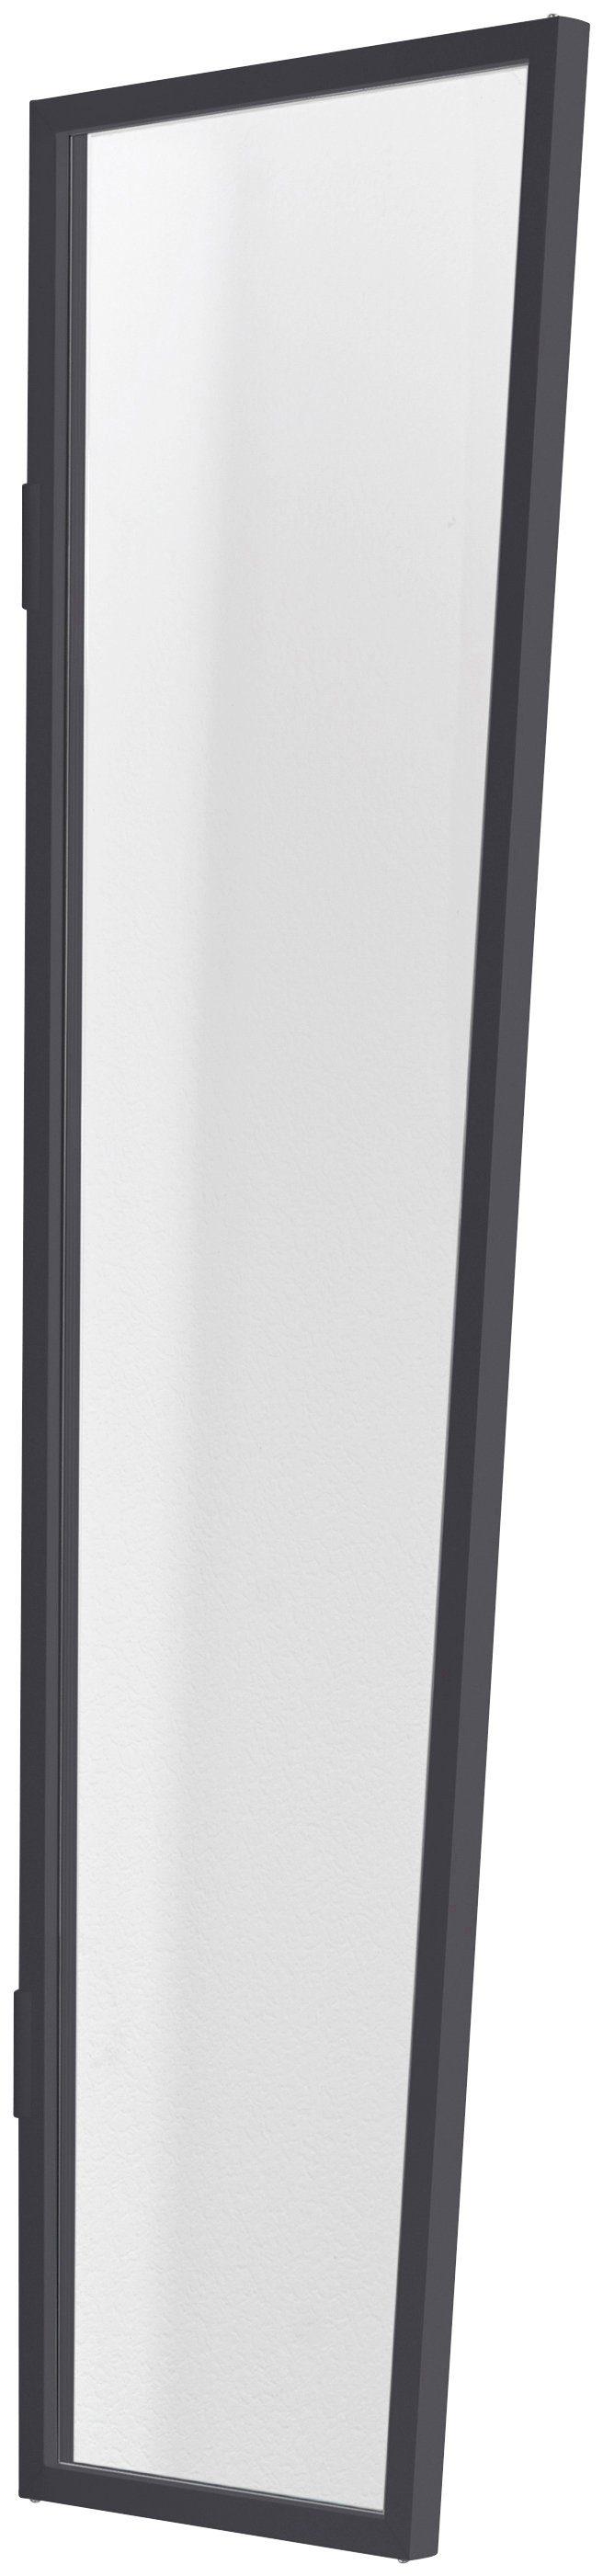 Gutta Seitenblende »B1 Acryl«, BxH: 60x200 cm, anthrazit-transparent